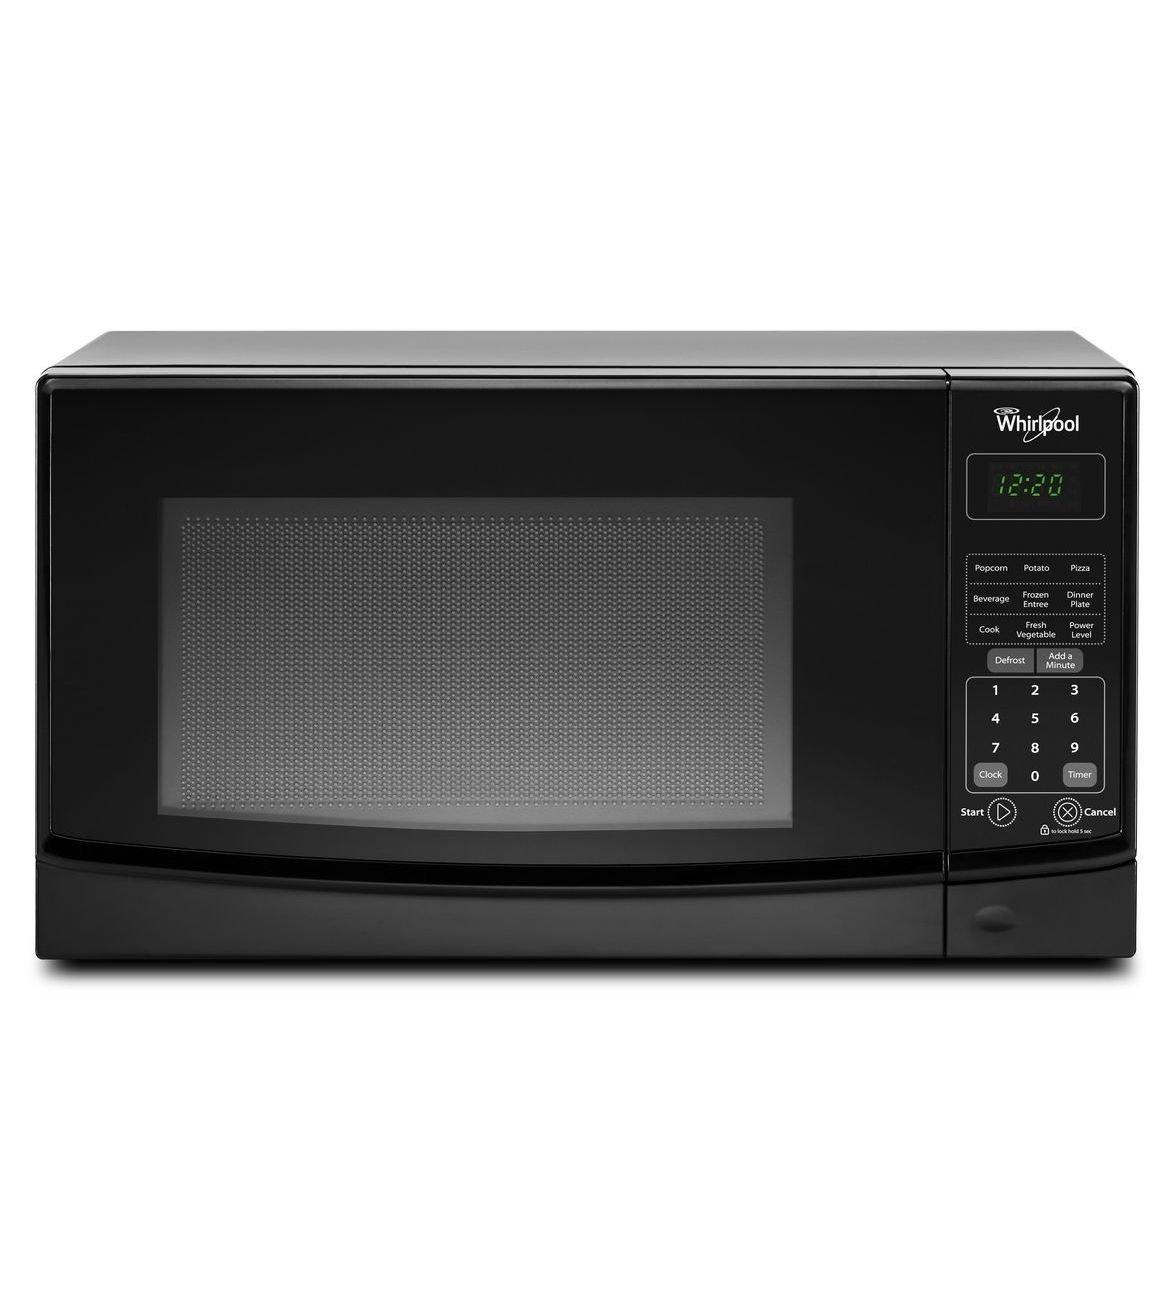 Whirlpool WMC10007AB 0.7 Cu. Ft. Black Countertop Microwave